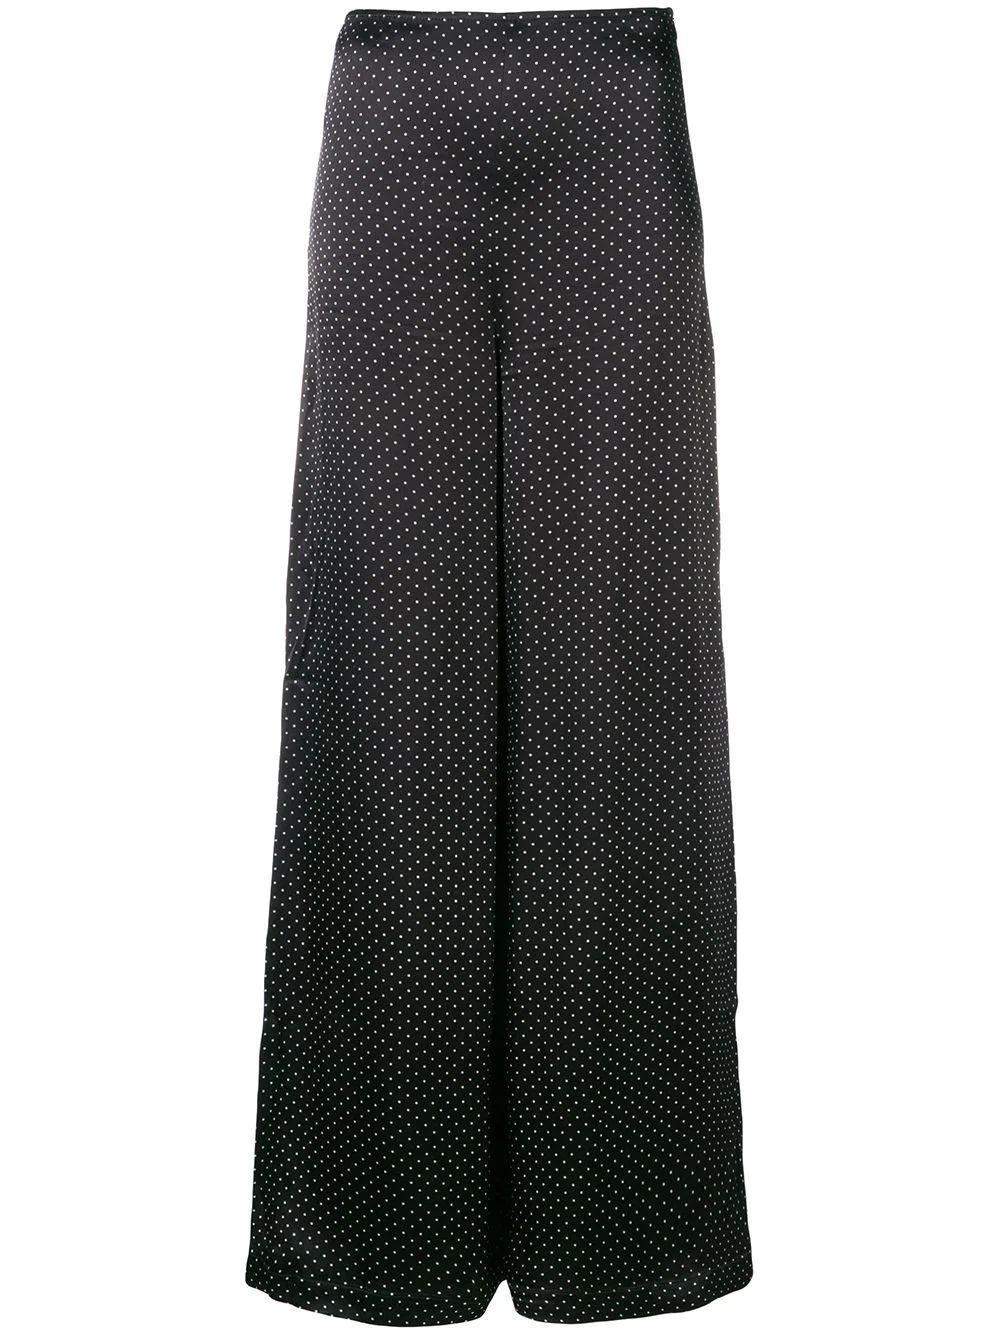 Cameron Dot Print Wide Leg Crop Pant Item # F2898